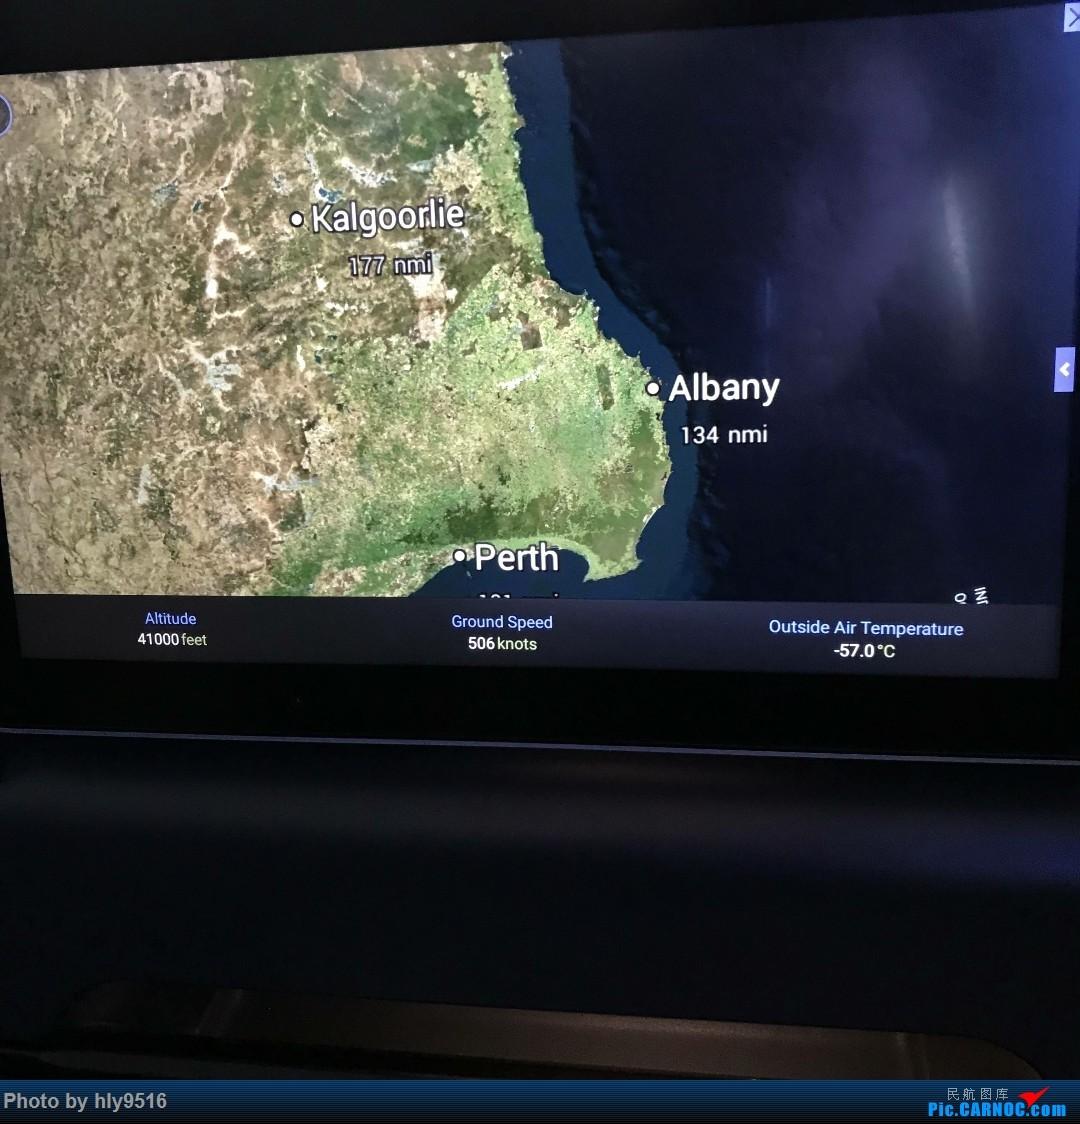 Re:[原创]【PER-MEL】第一次发游记,体验澳航最长航线QF10澳洲国内段 BOEING 787-9 VH-ZNA